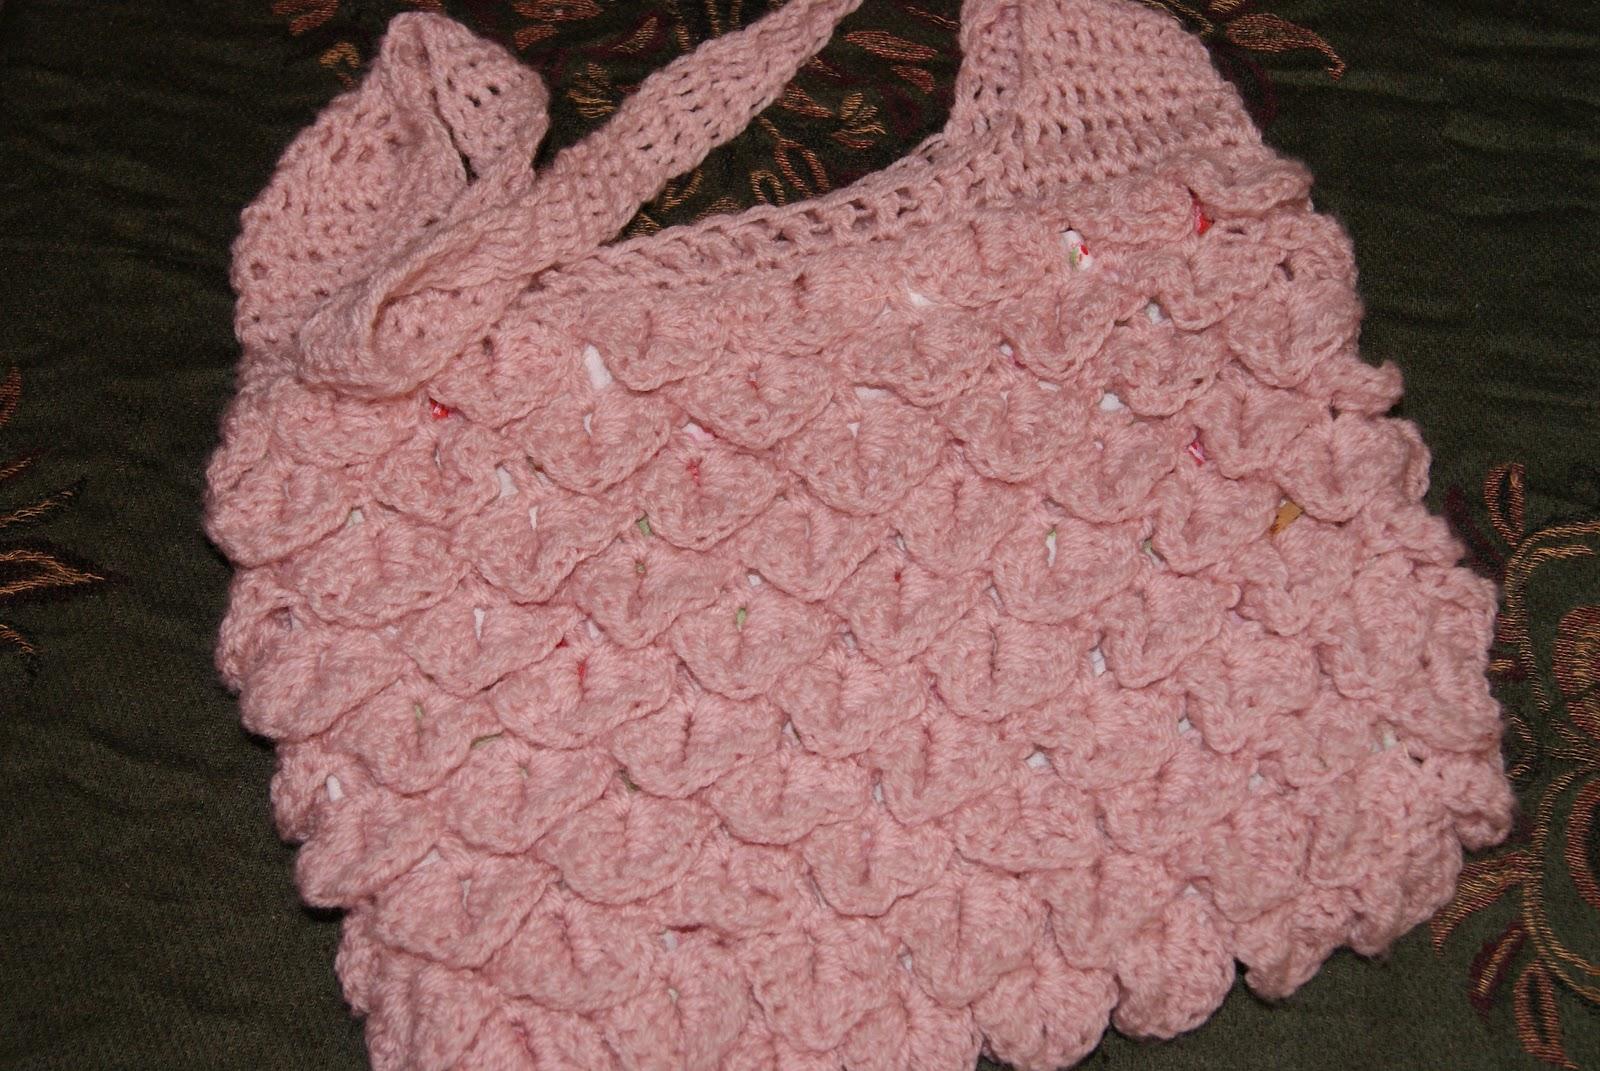 Free Crochet Pattern Crocodile Stitch Bag : Reks Art Corner: Crochet Crocodile Stitch Bag